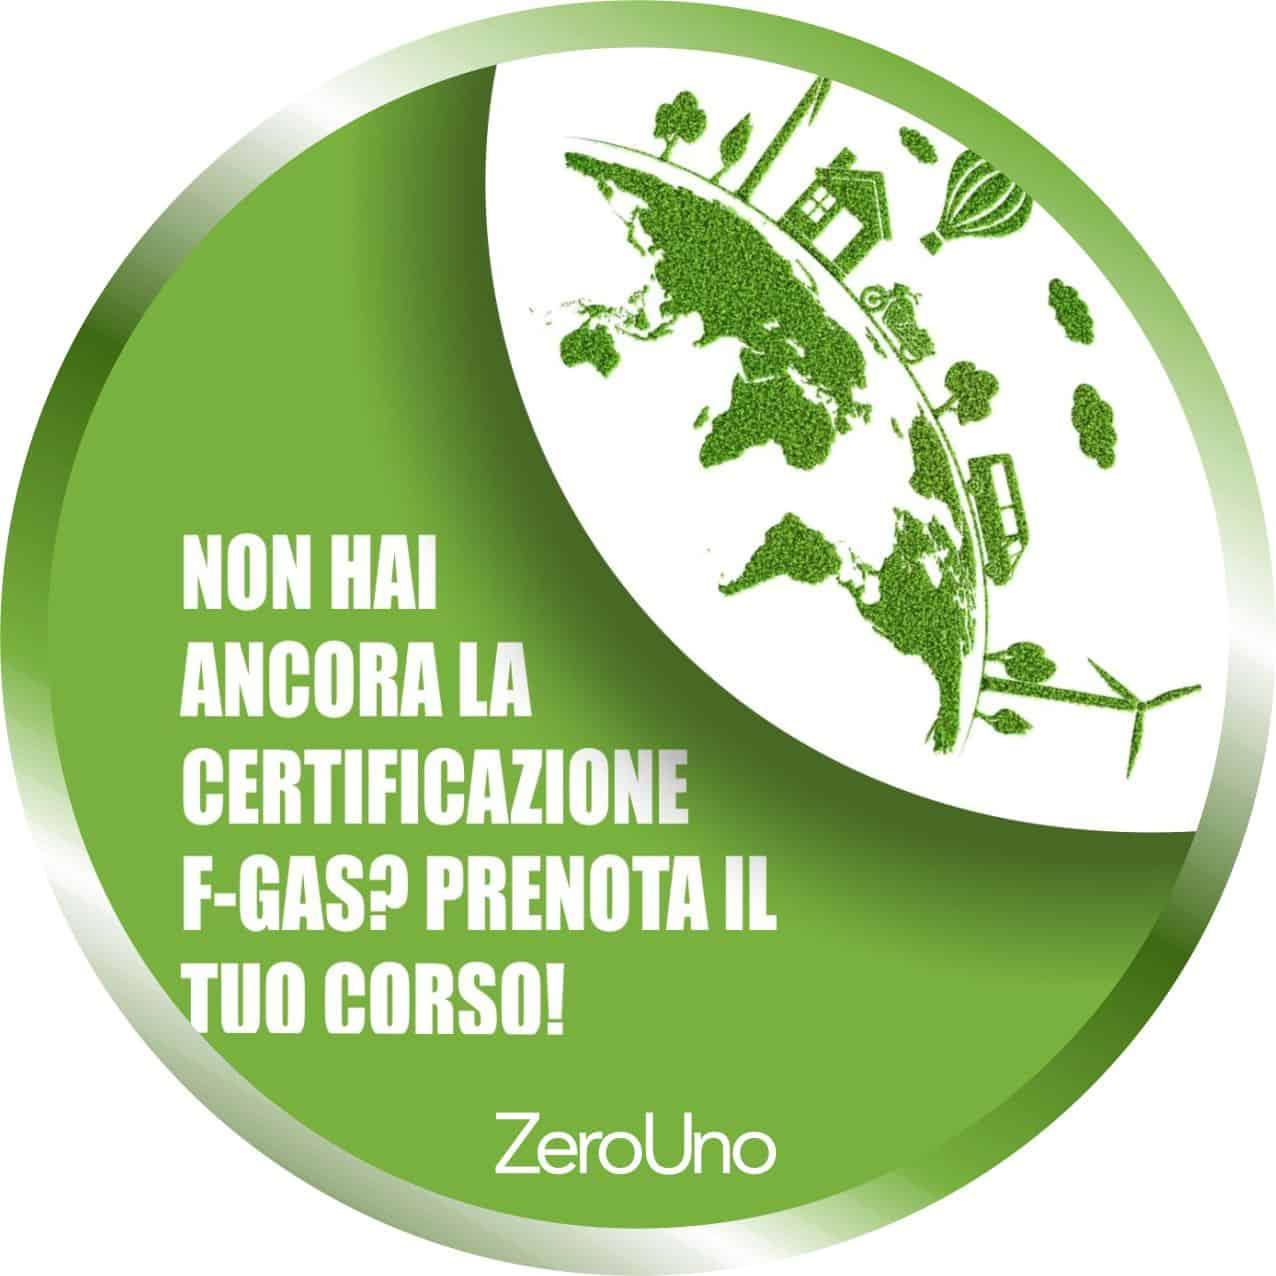 Prenota il corso f-gas!   Elettrogruppo ZeroUno   Beinasco   Torino   disco news prenota corso f-gas